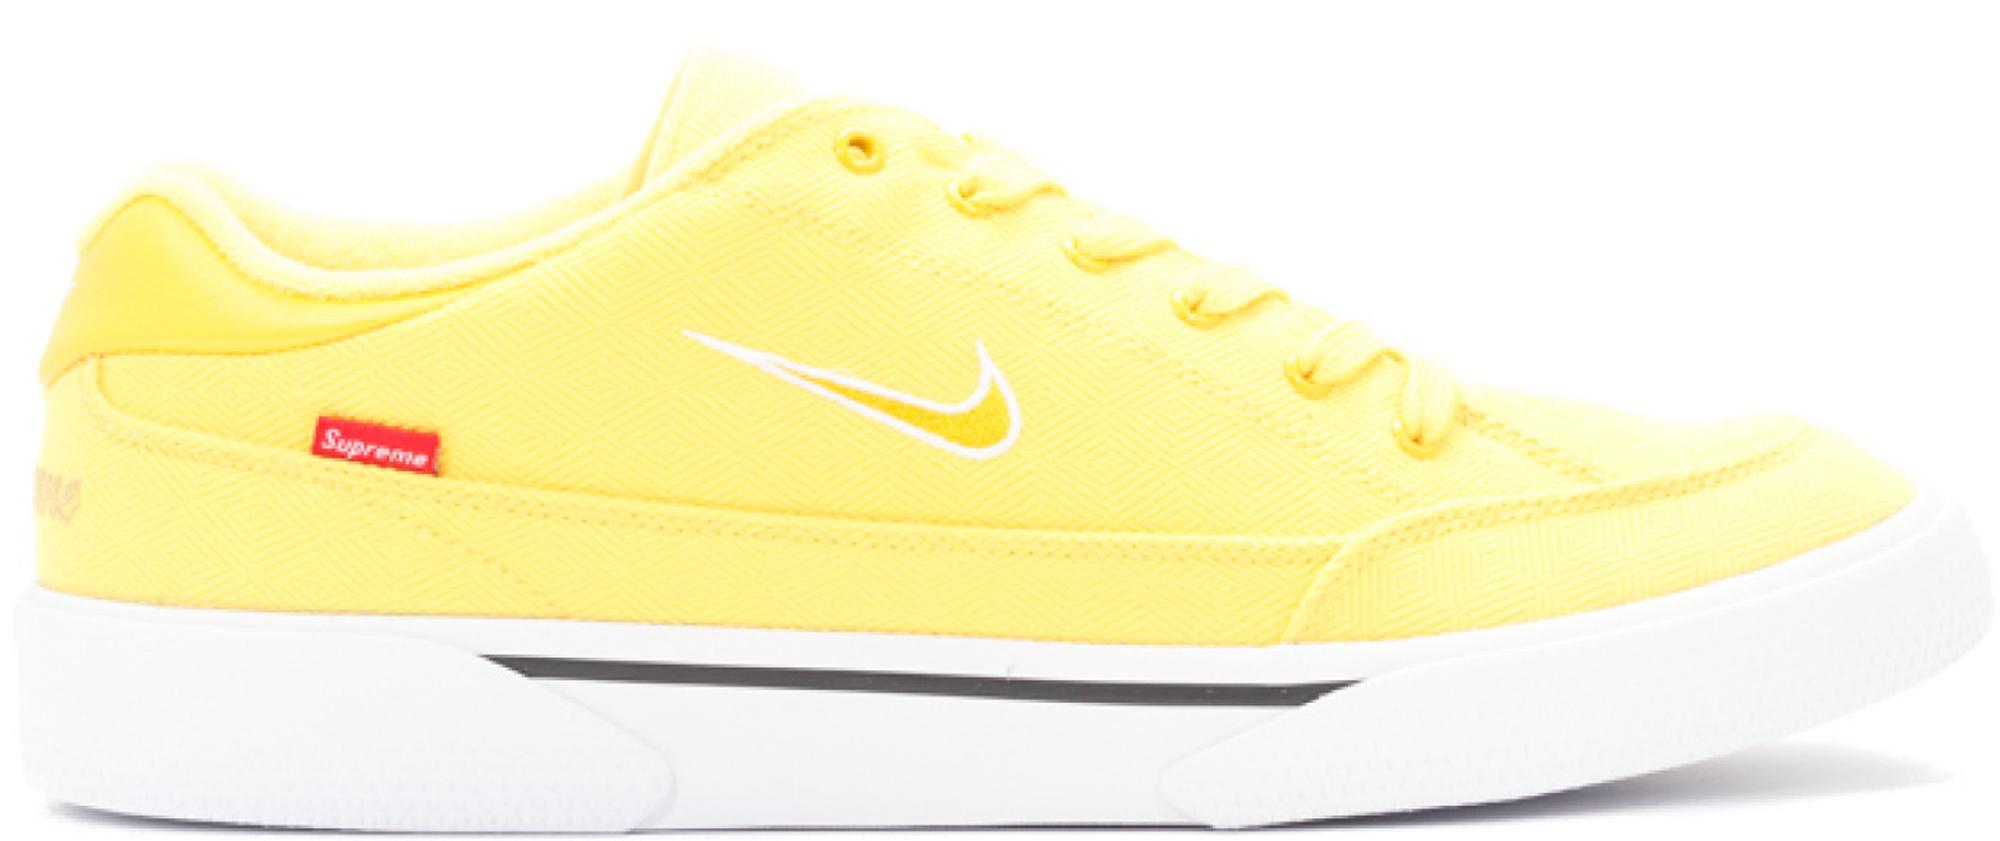 Nike SB GTS Supreme Yellow - 801621-771